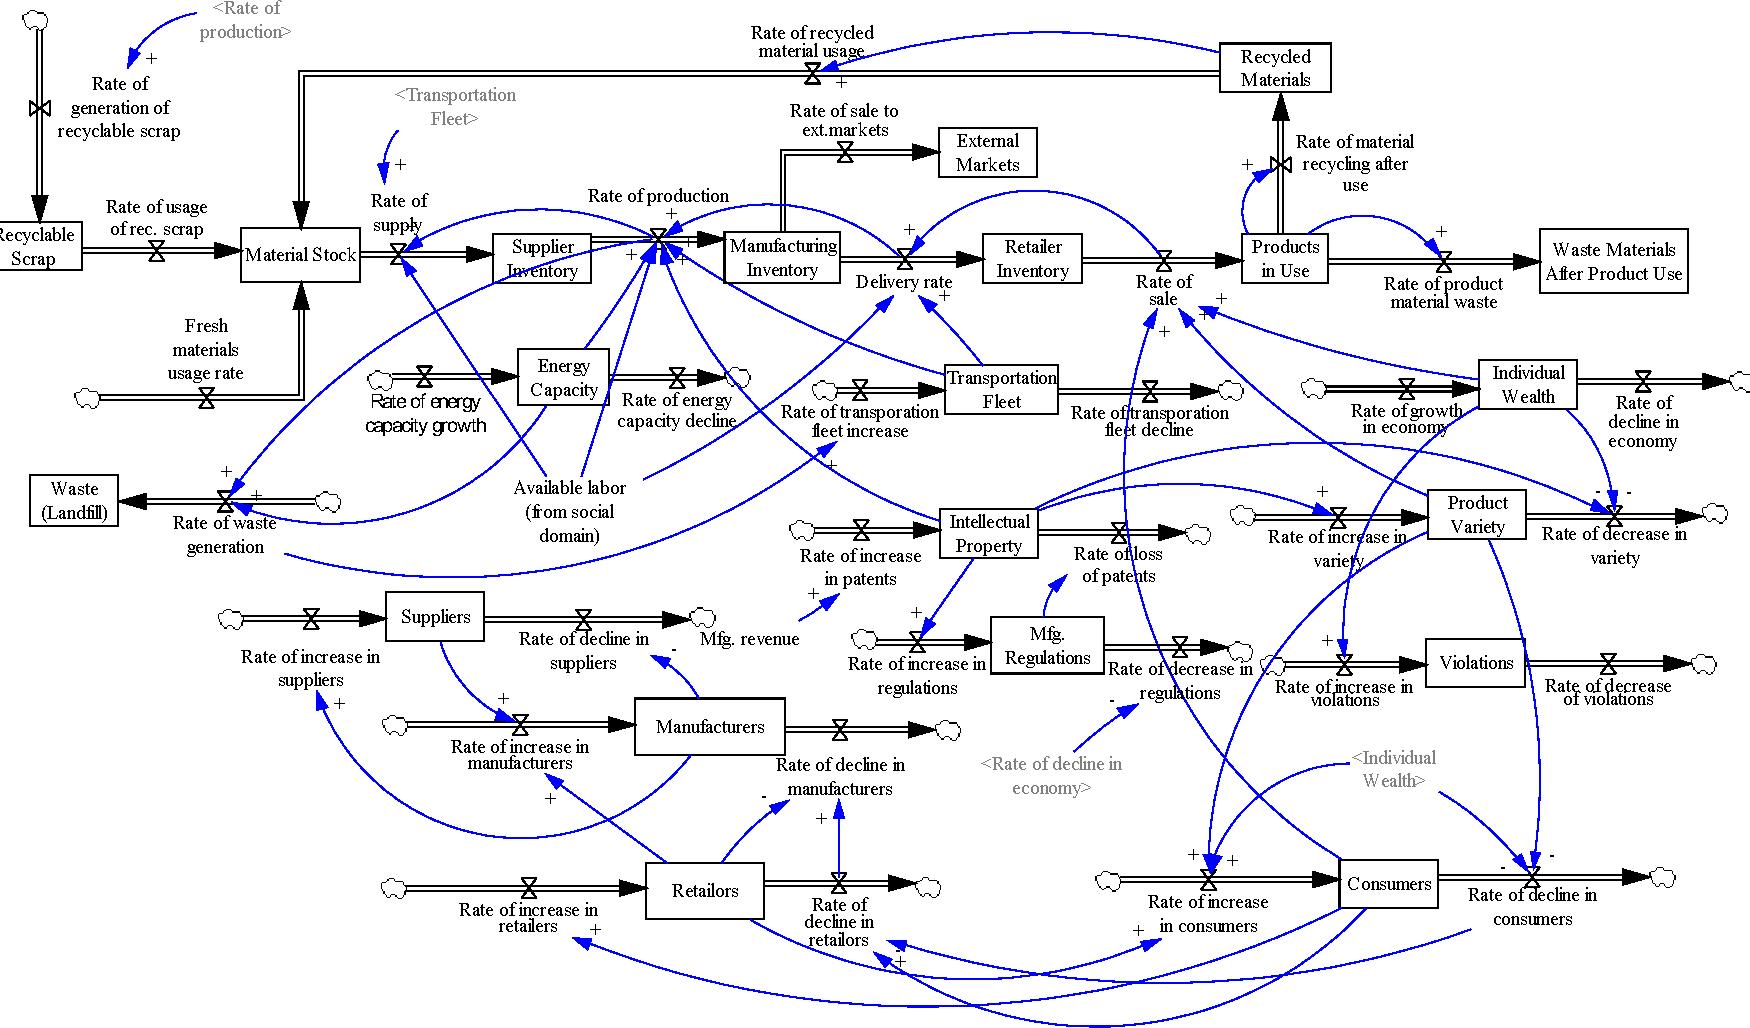 Figure 2. Manufacturing domain model